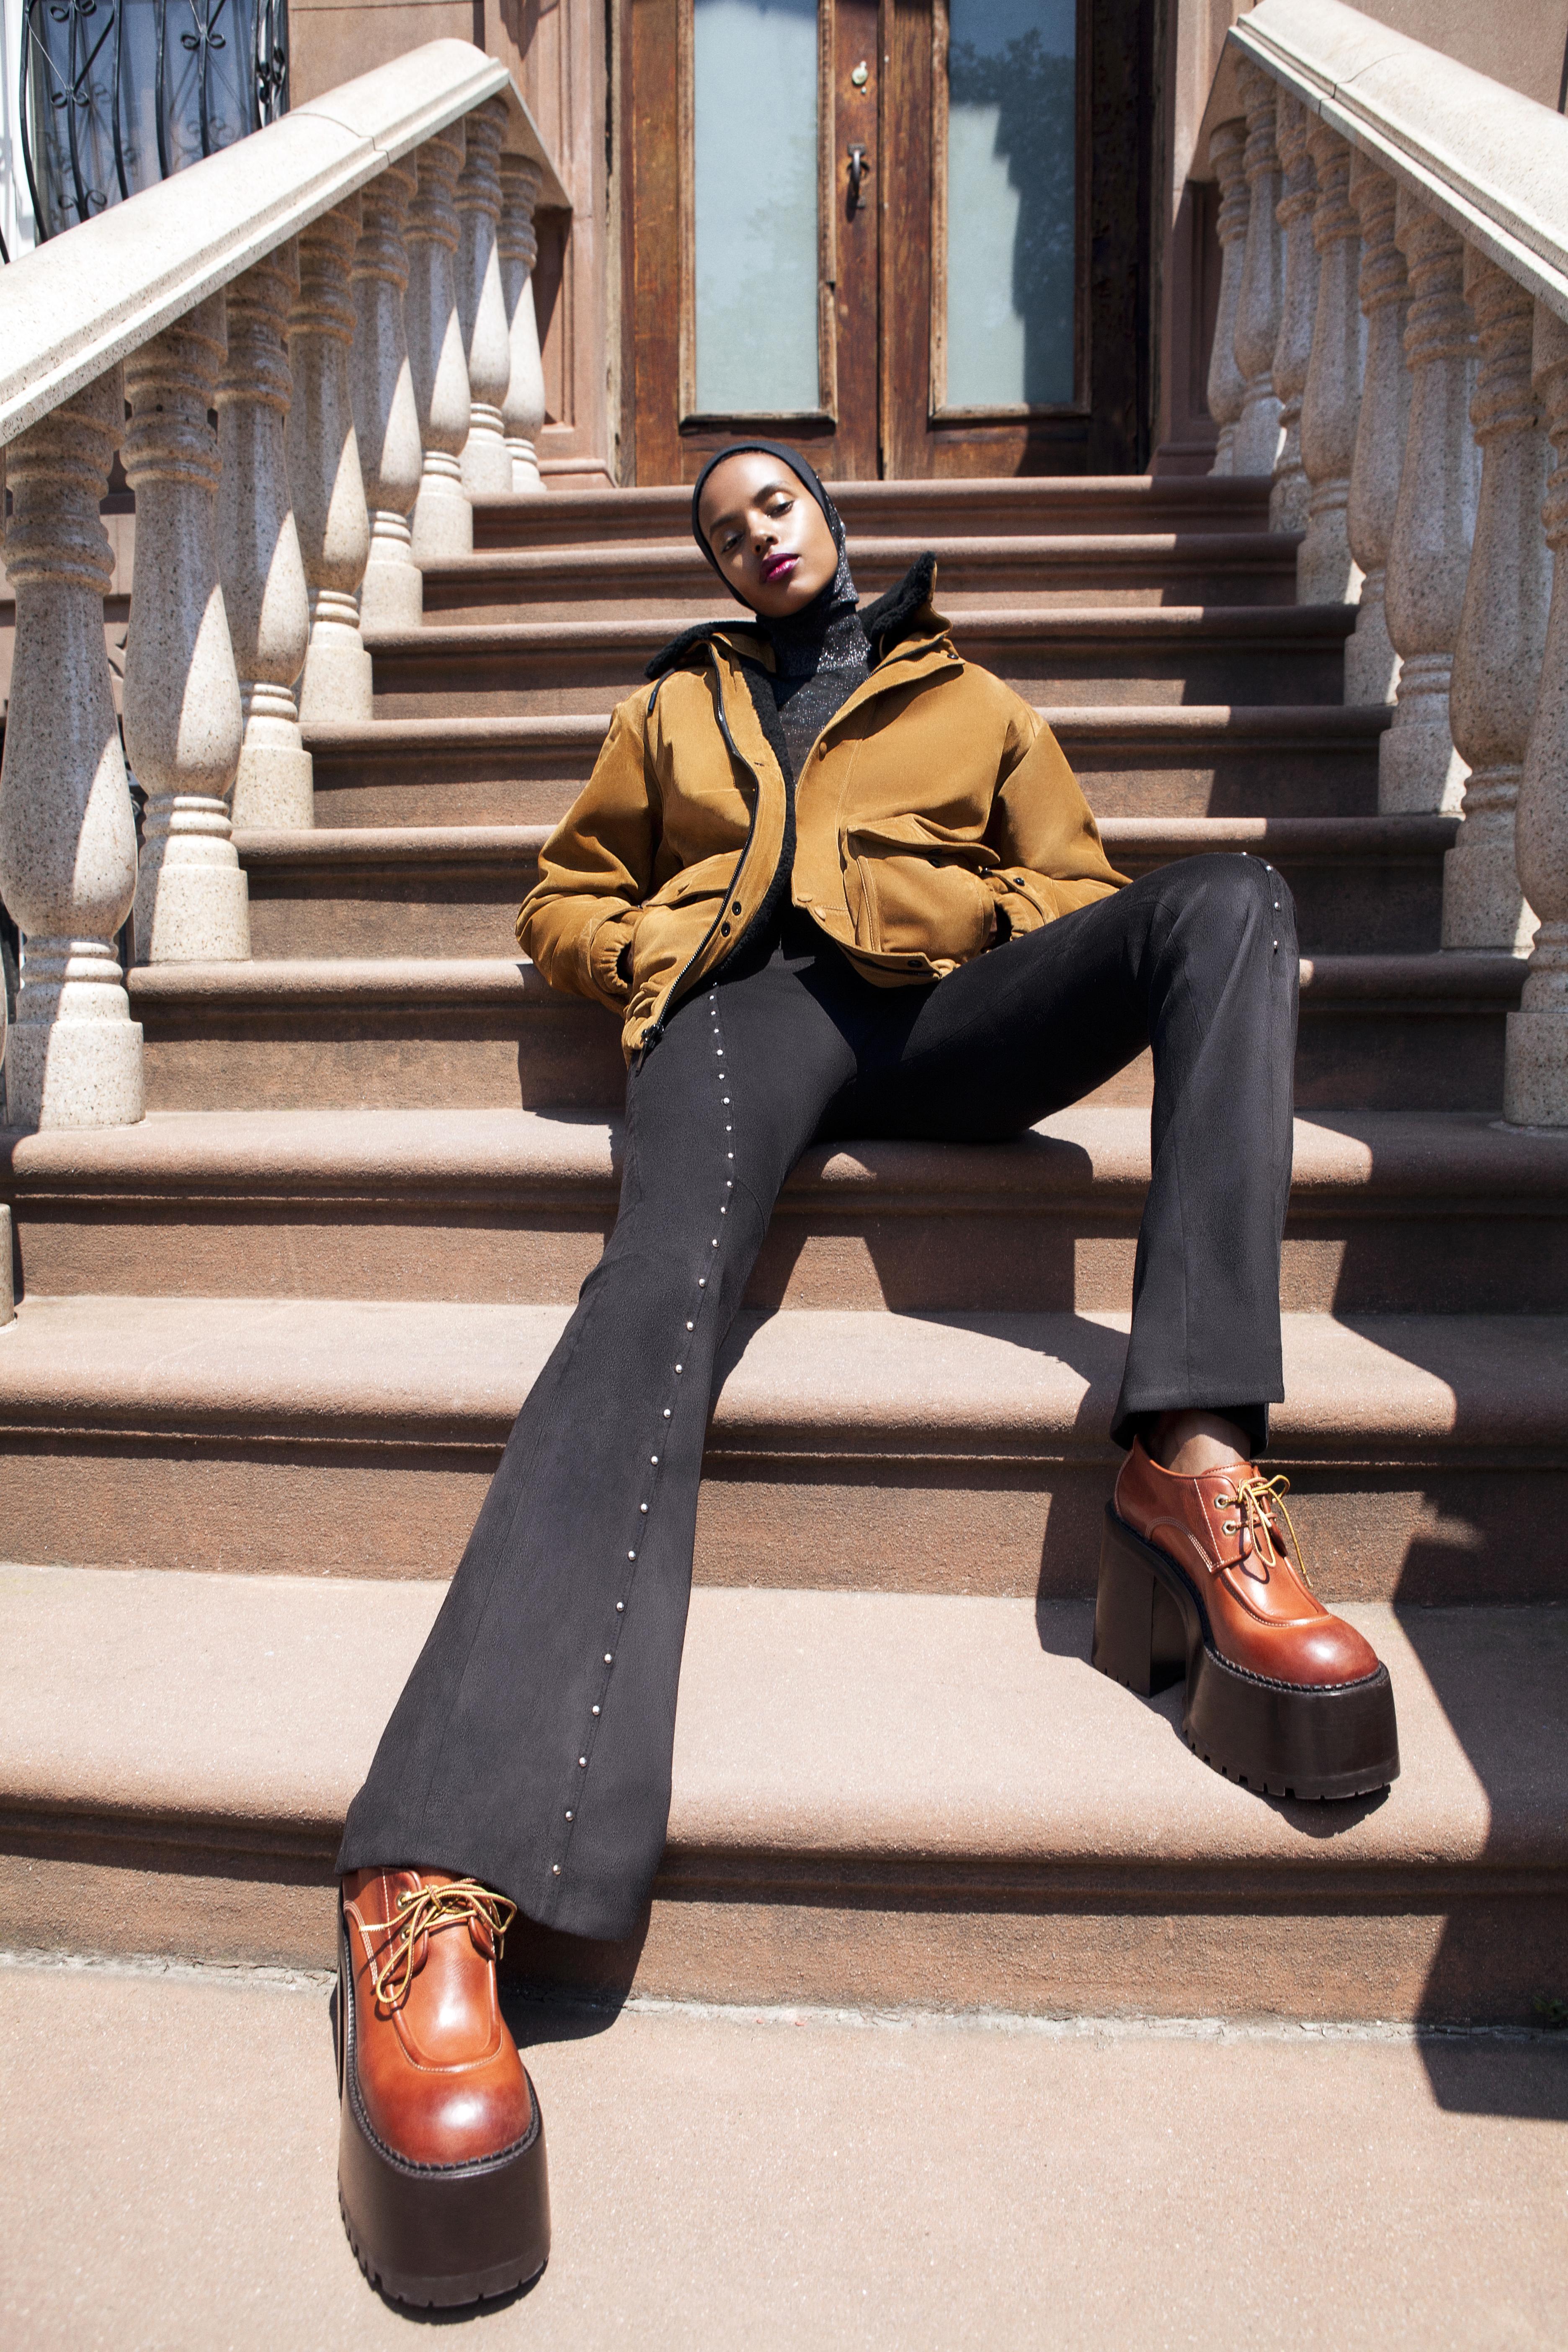 Style Rock clothing tumblr, Kitchen luxury designs